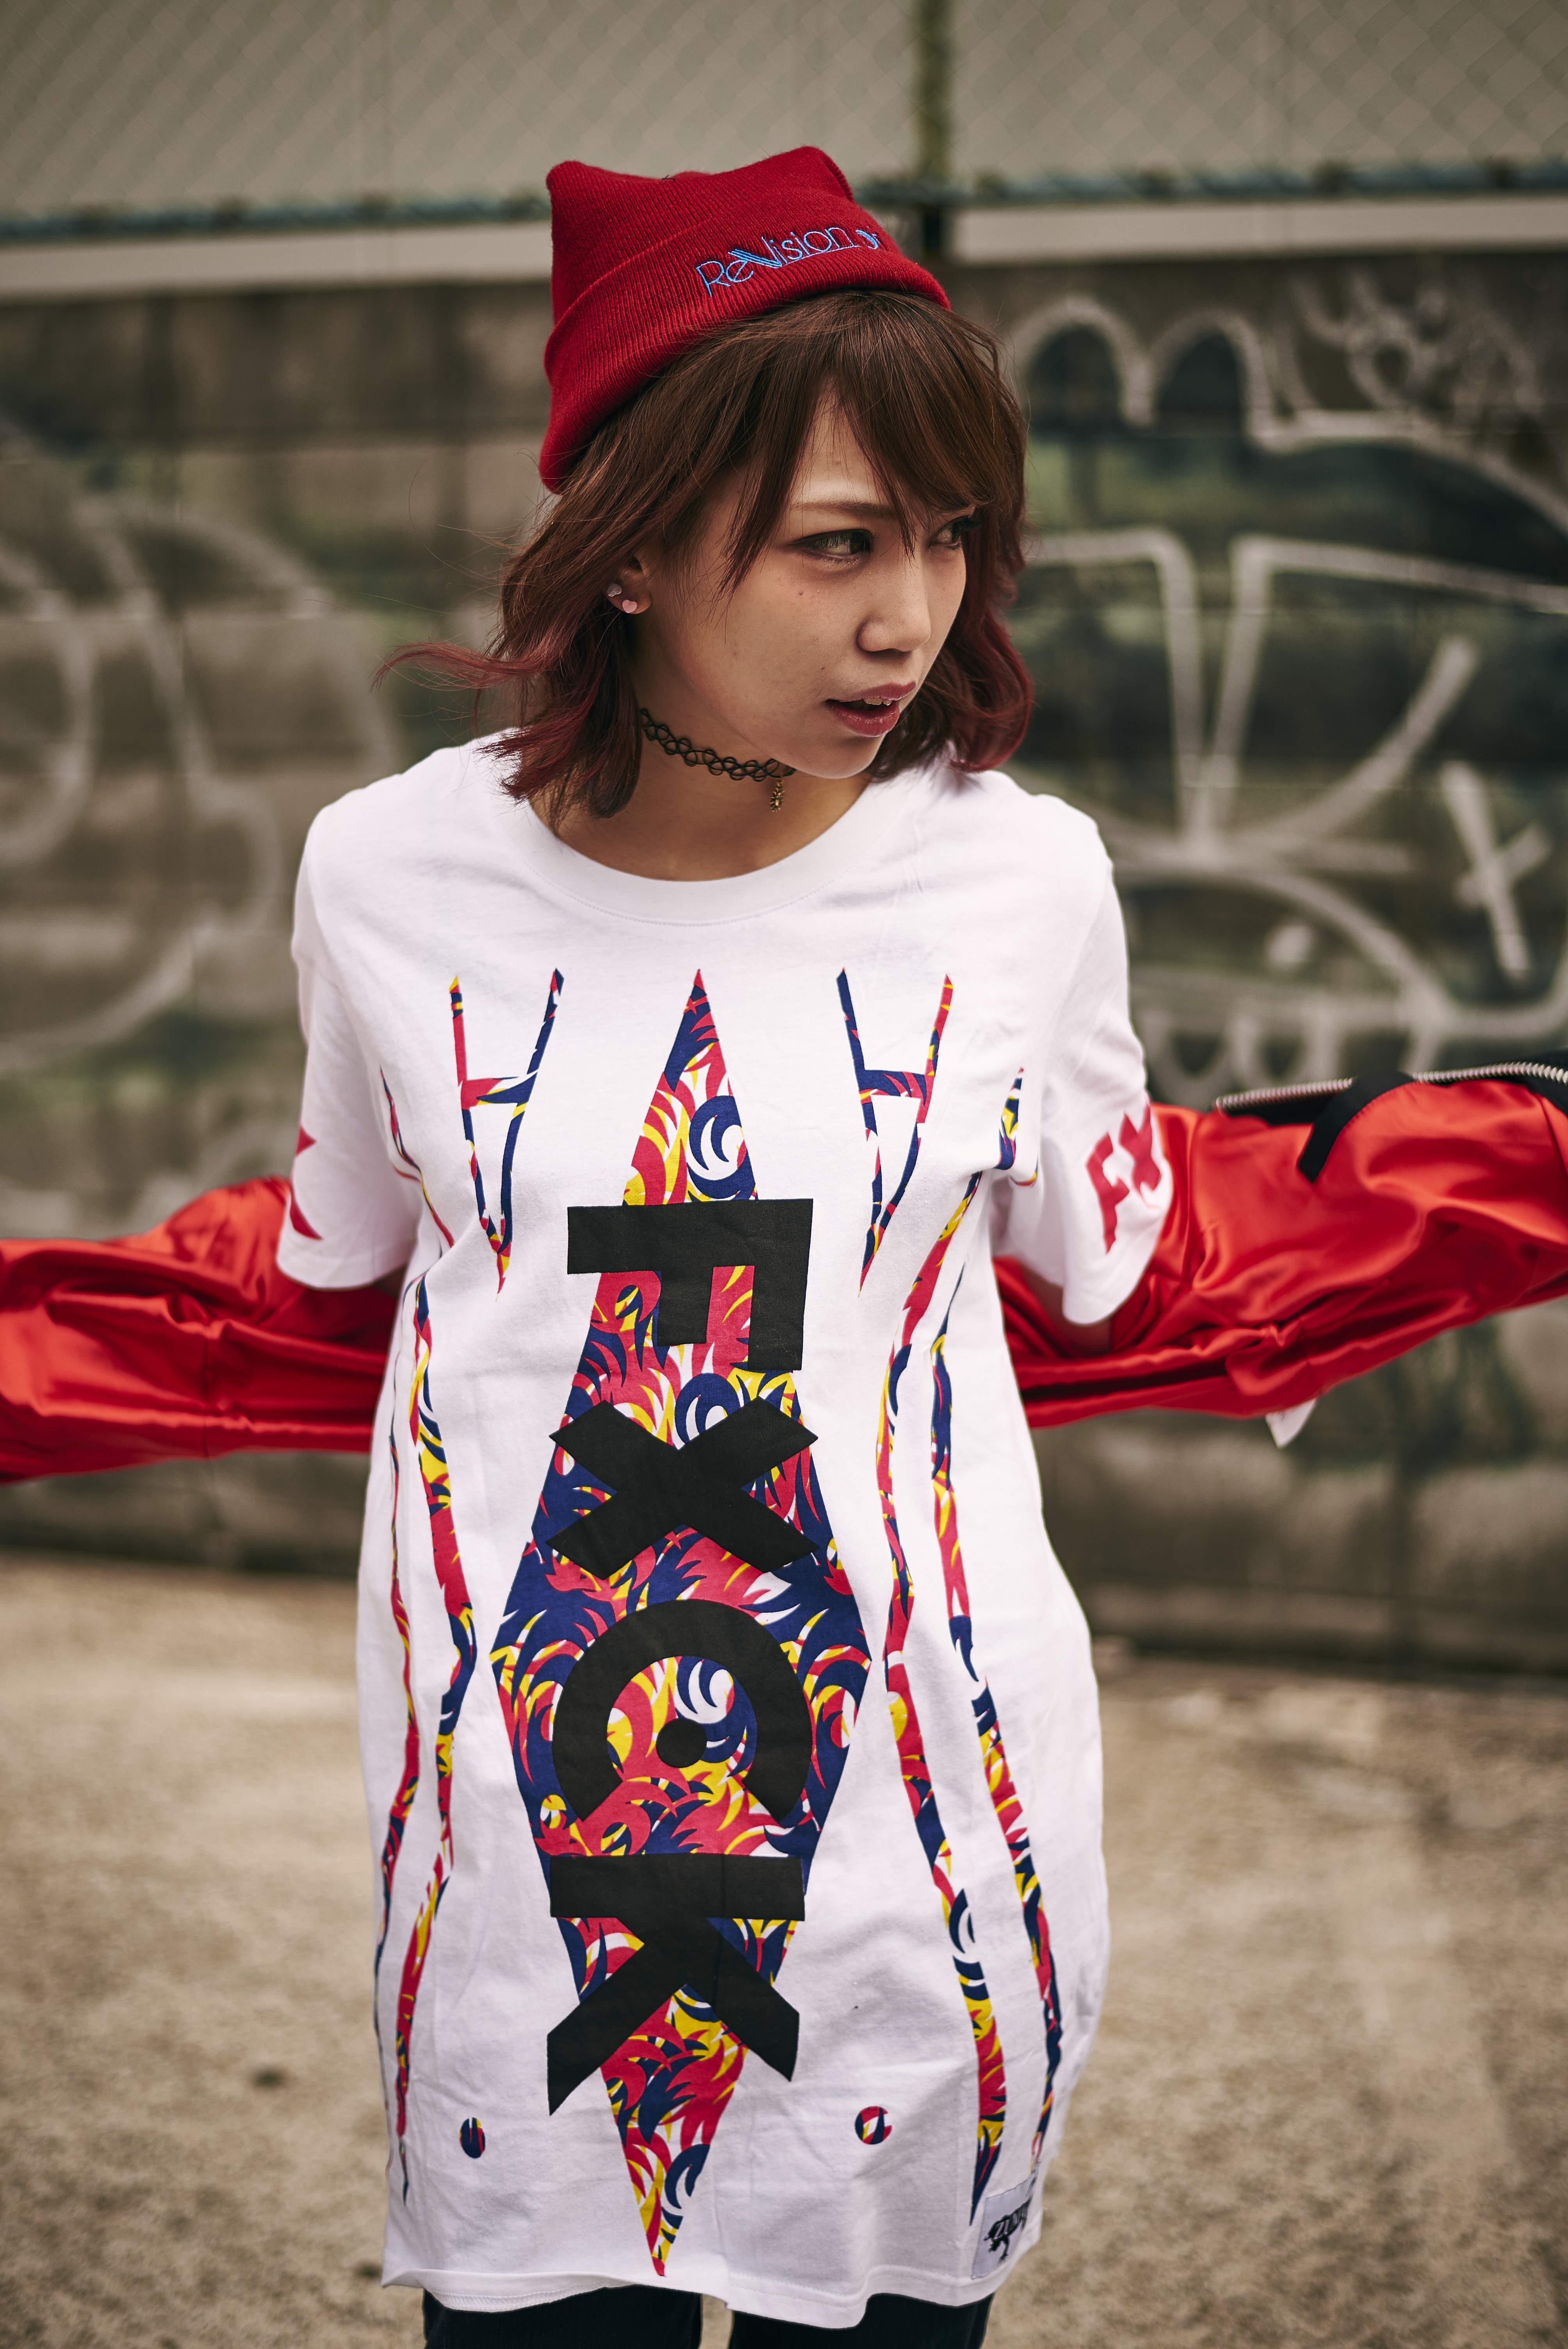 【ZUMA】ワンピースTシャツ - FxCK